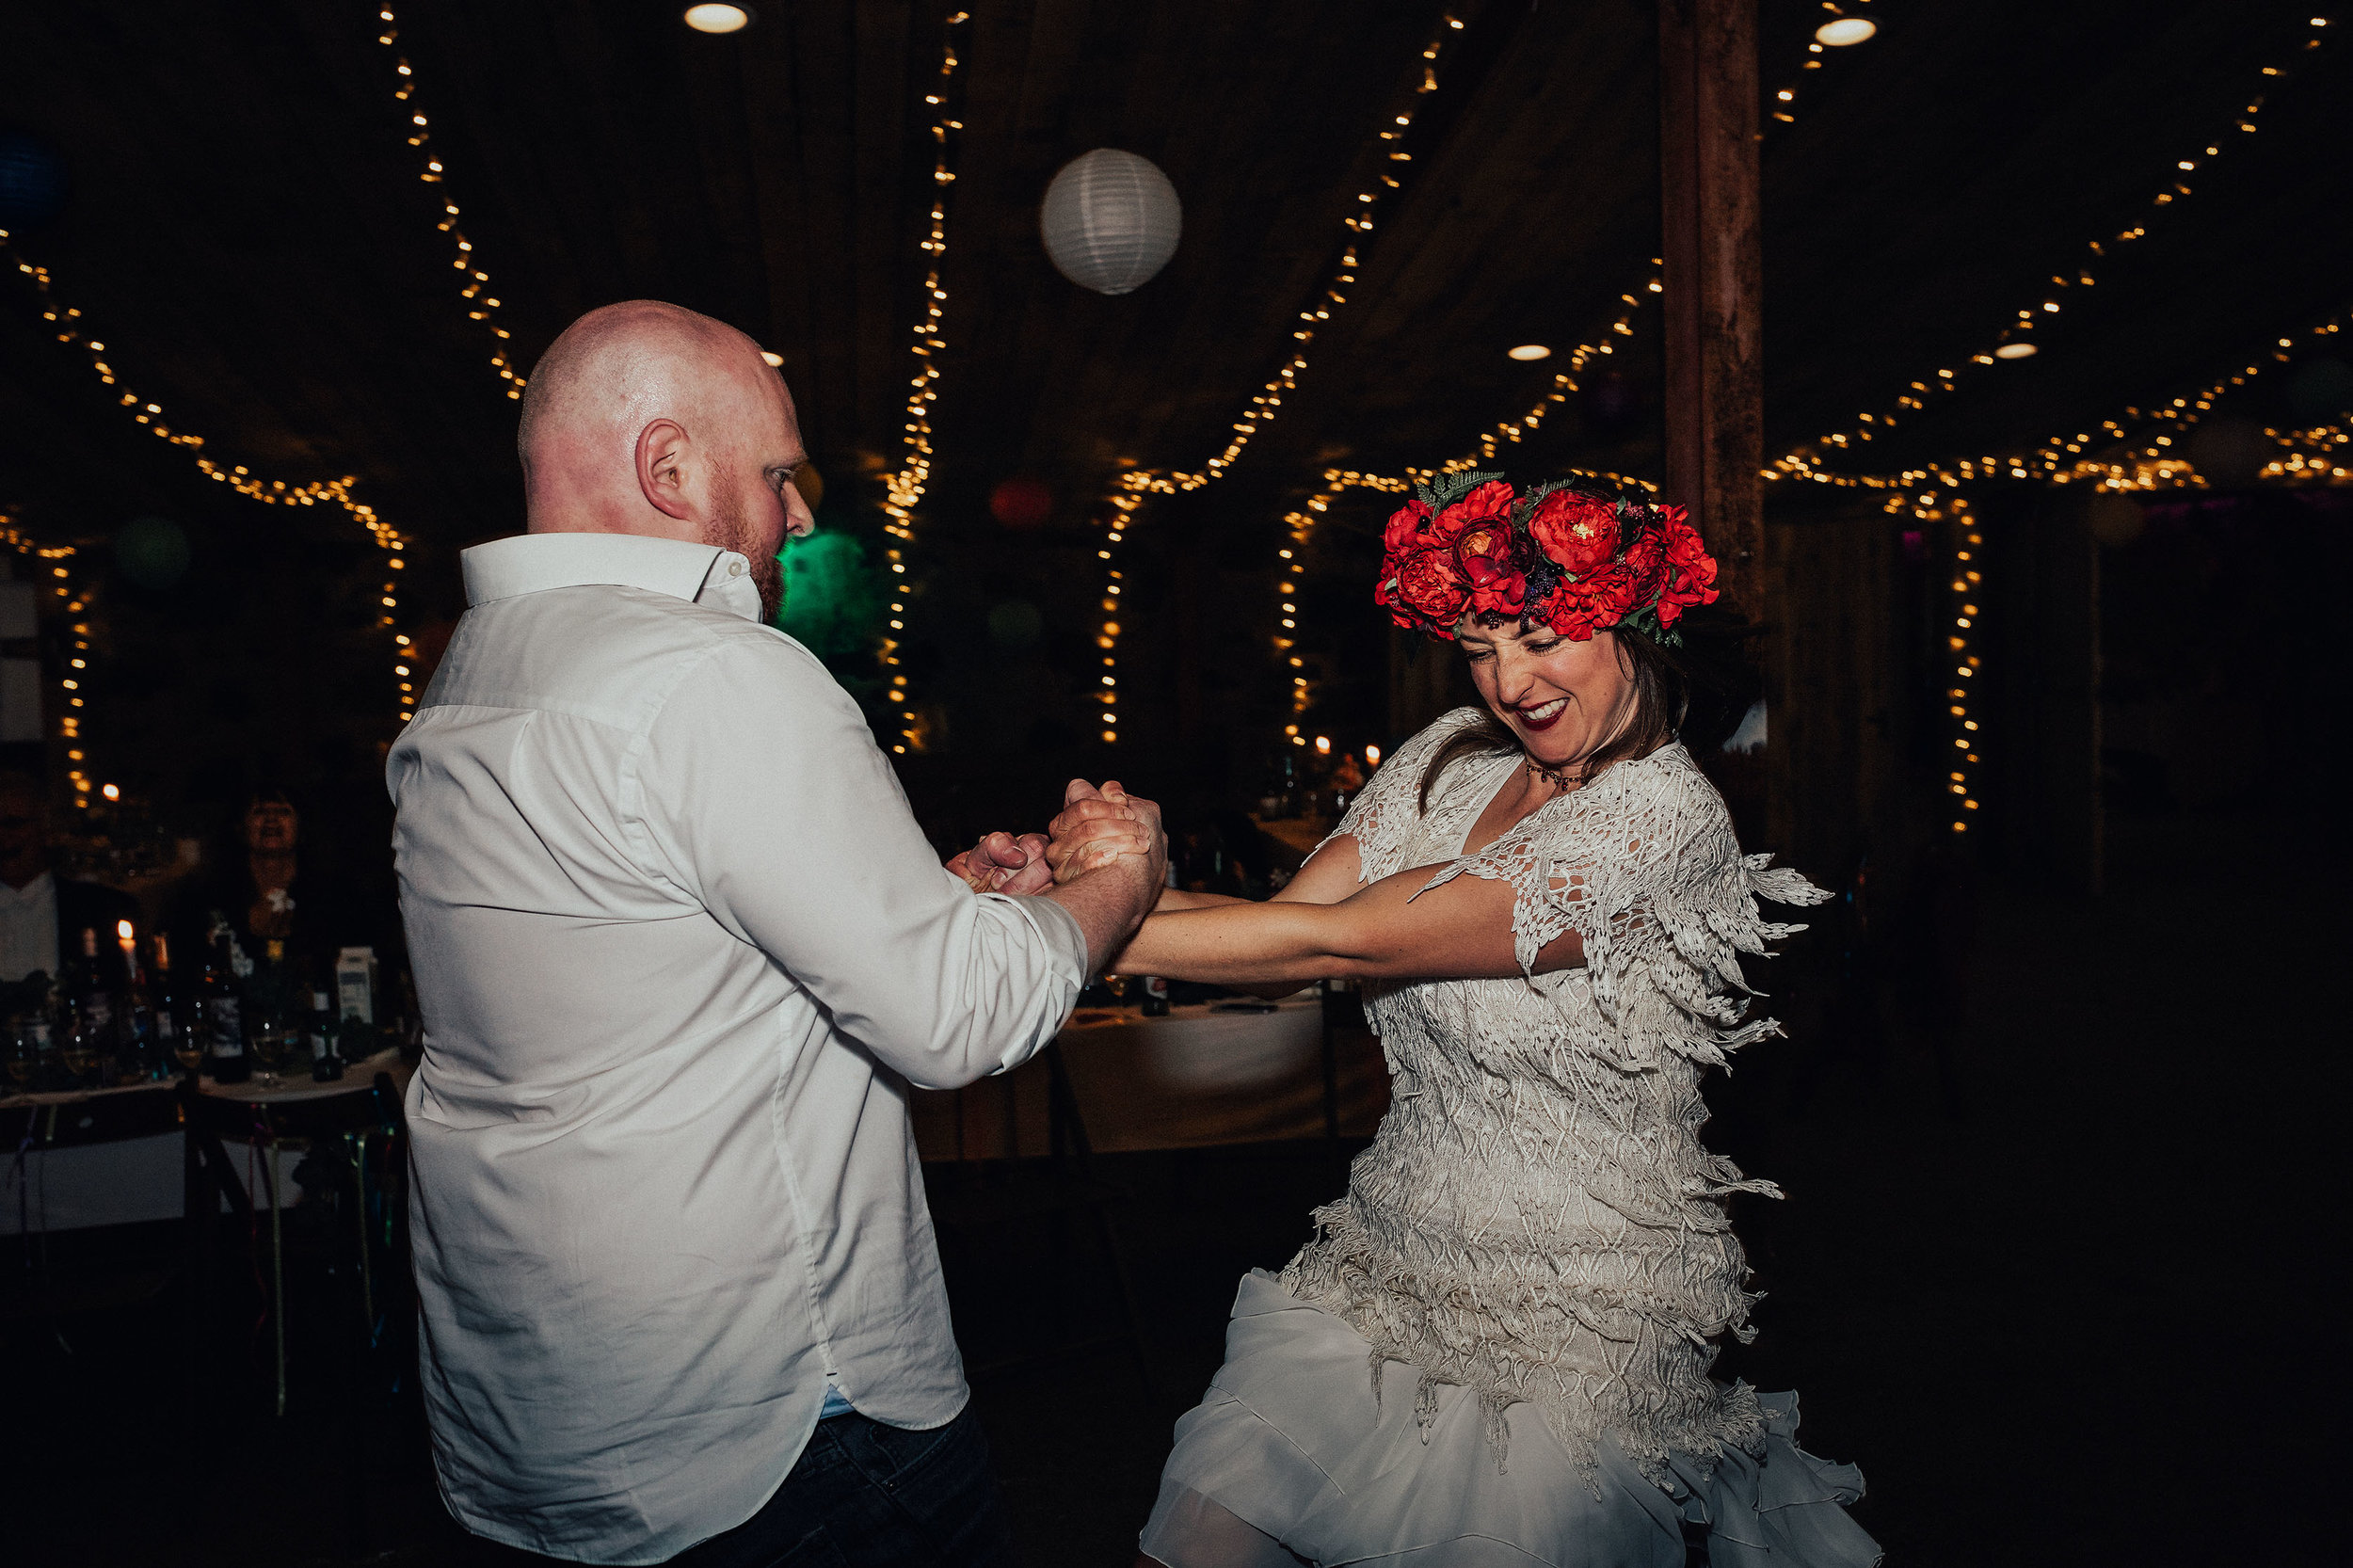 COMRIE_CROFT_WEDDINGS_PJ_PHILLIPS_PHOTOGRAPHY_199.jpg